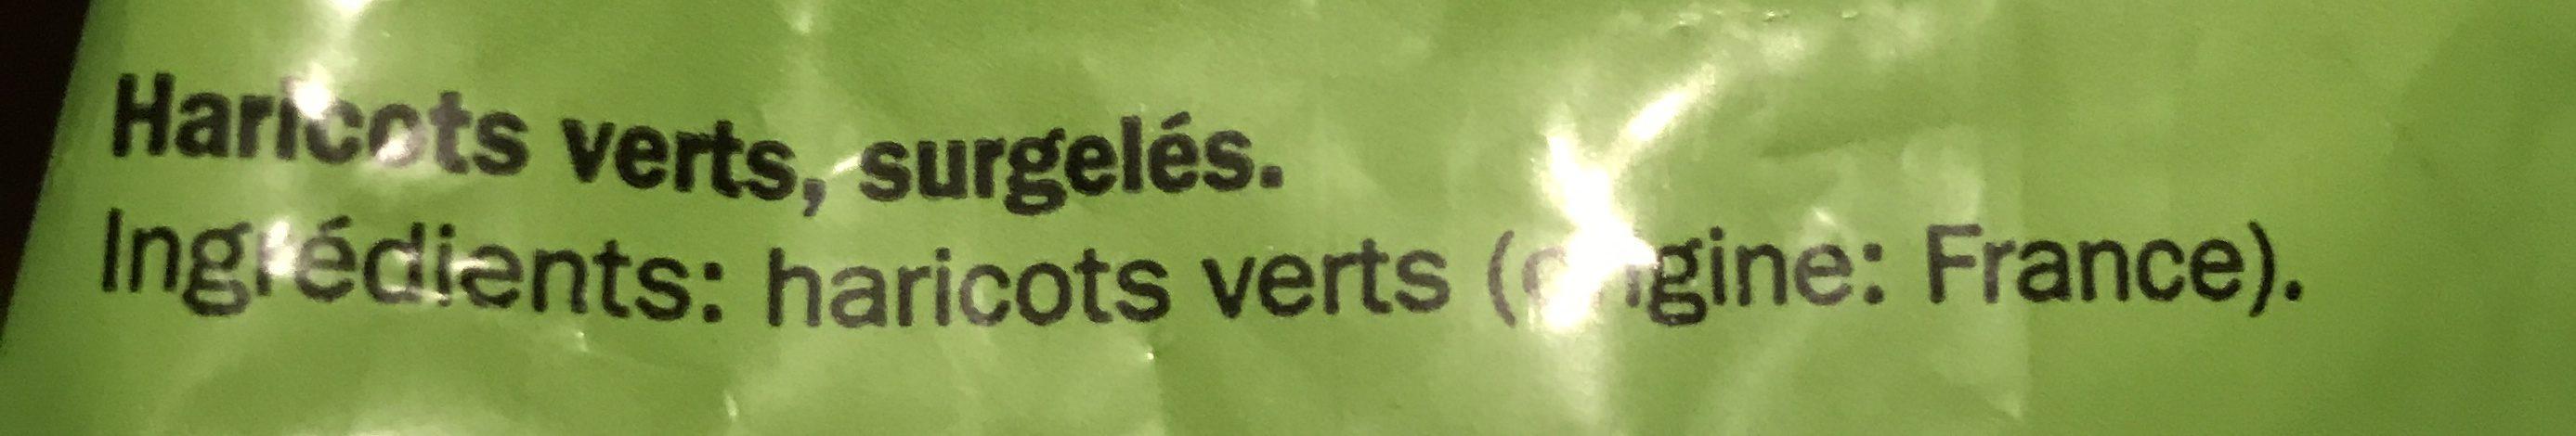 Haricots verts, surgelés - Ingrediënten